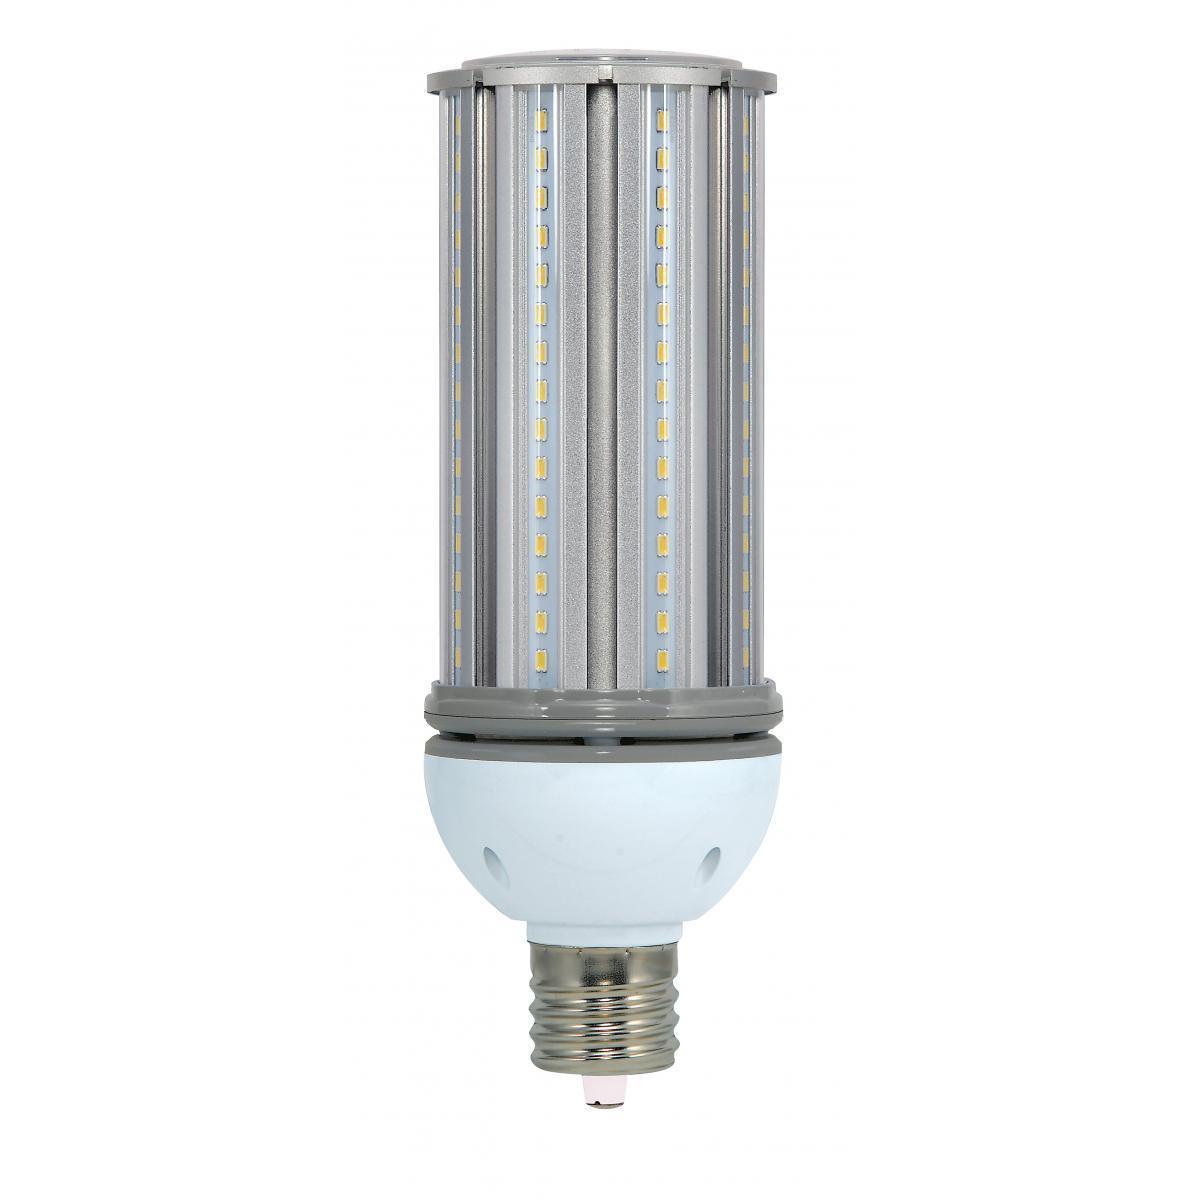 SATCO 45W Hi-Pro LED - HID Replacement - Mogul Base - 500...